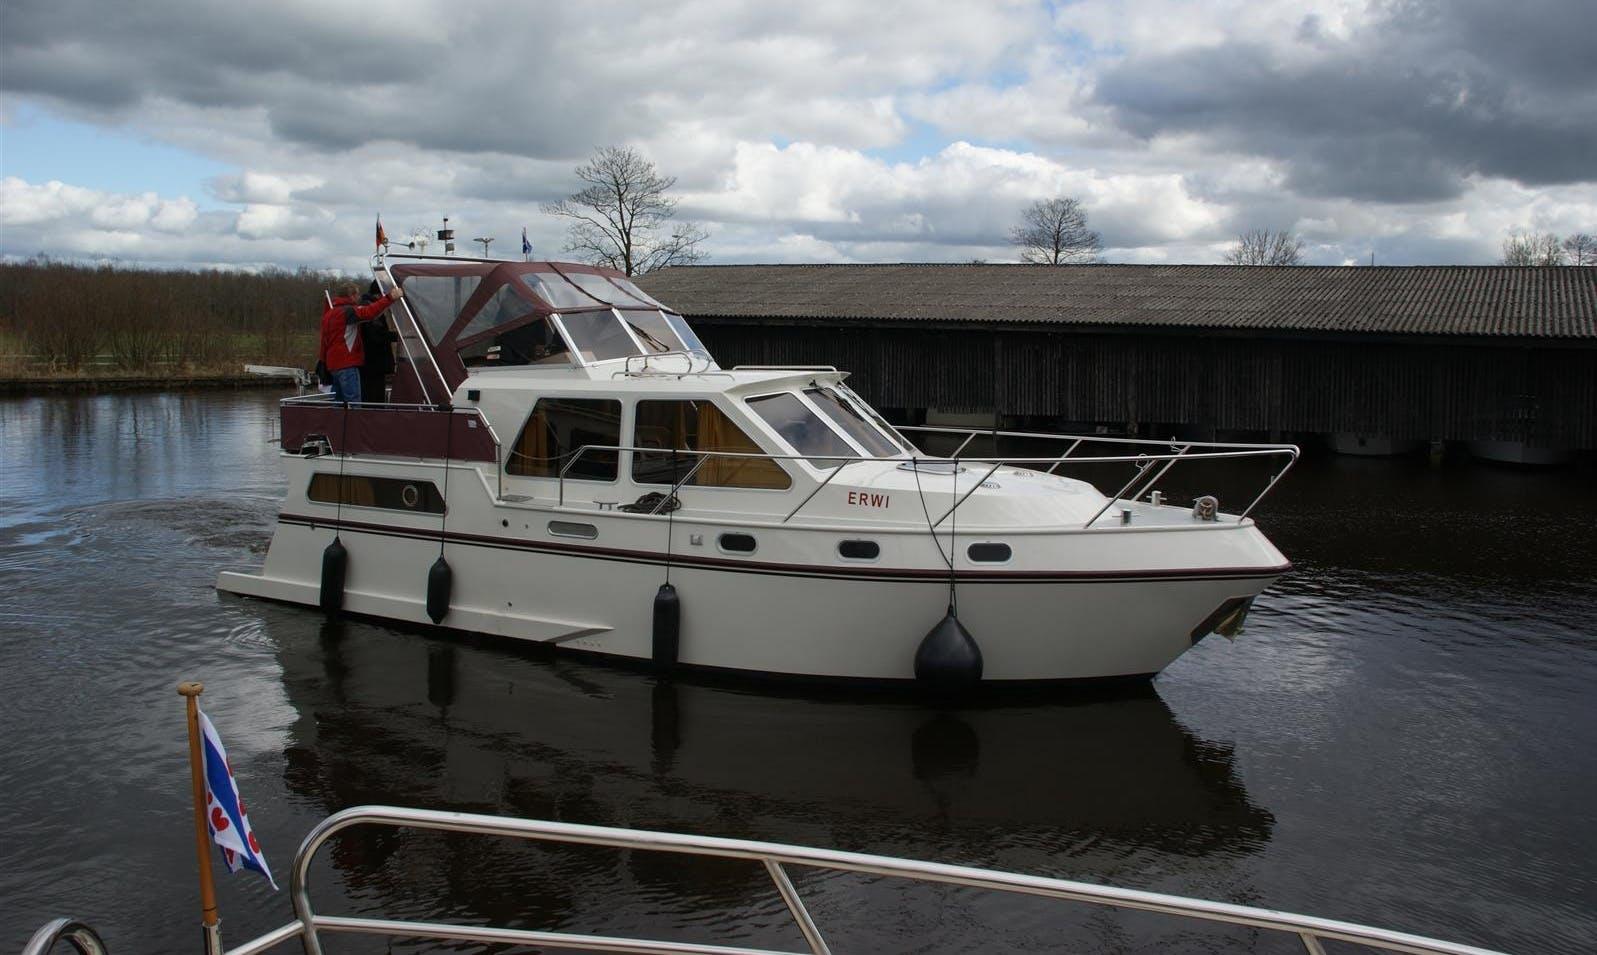 Enjoy Friesland, Netherlands by 34' Erwi Motor Yacht